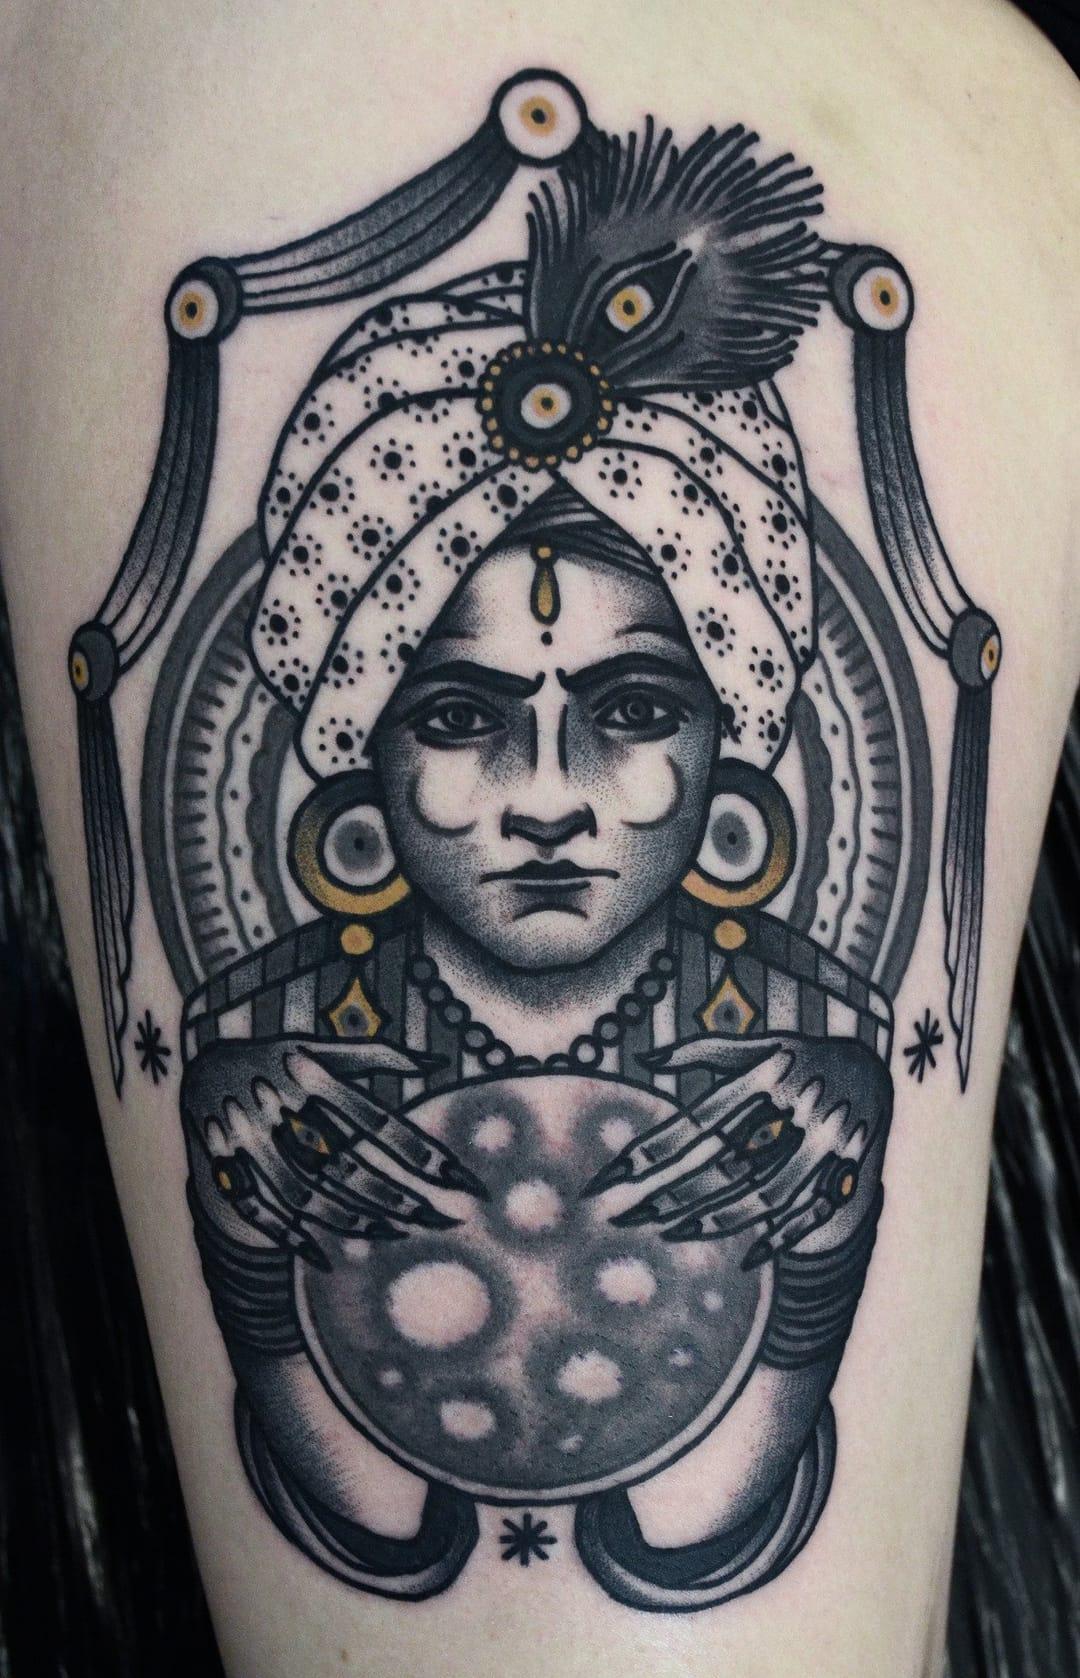 Fortune Teller Tattoos